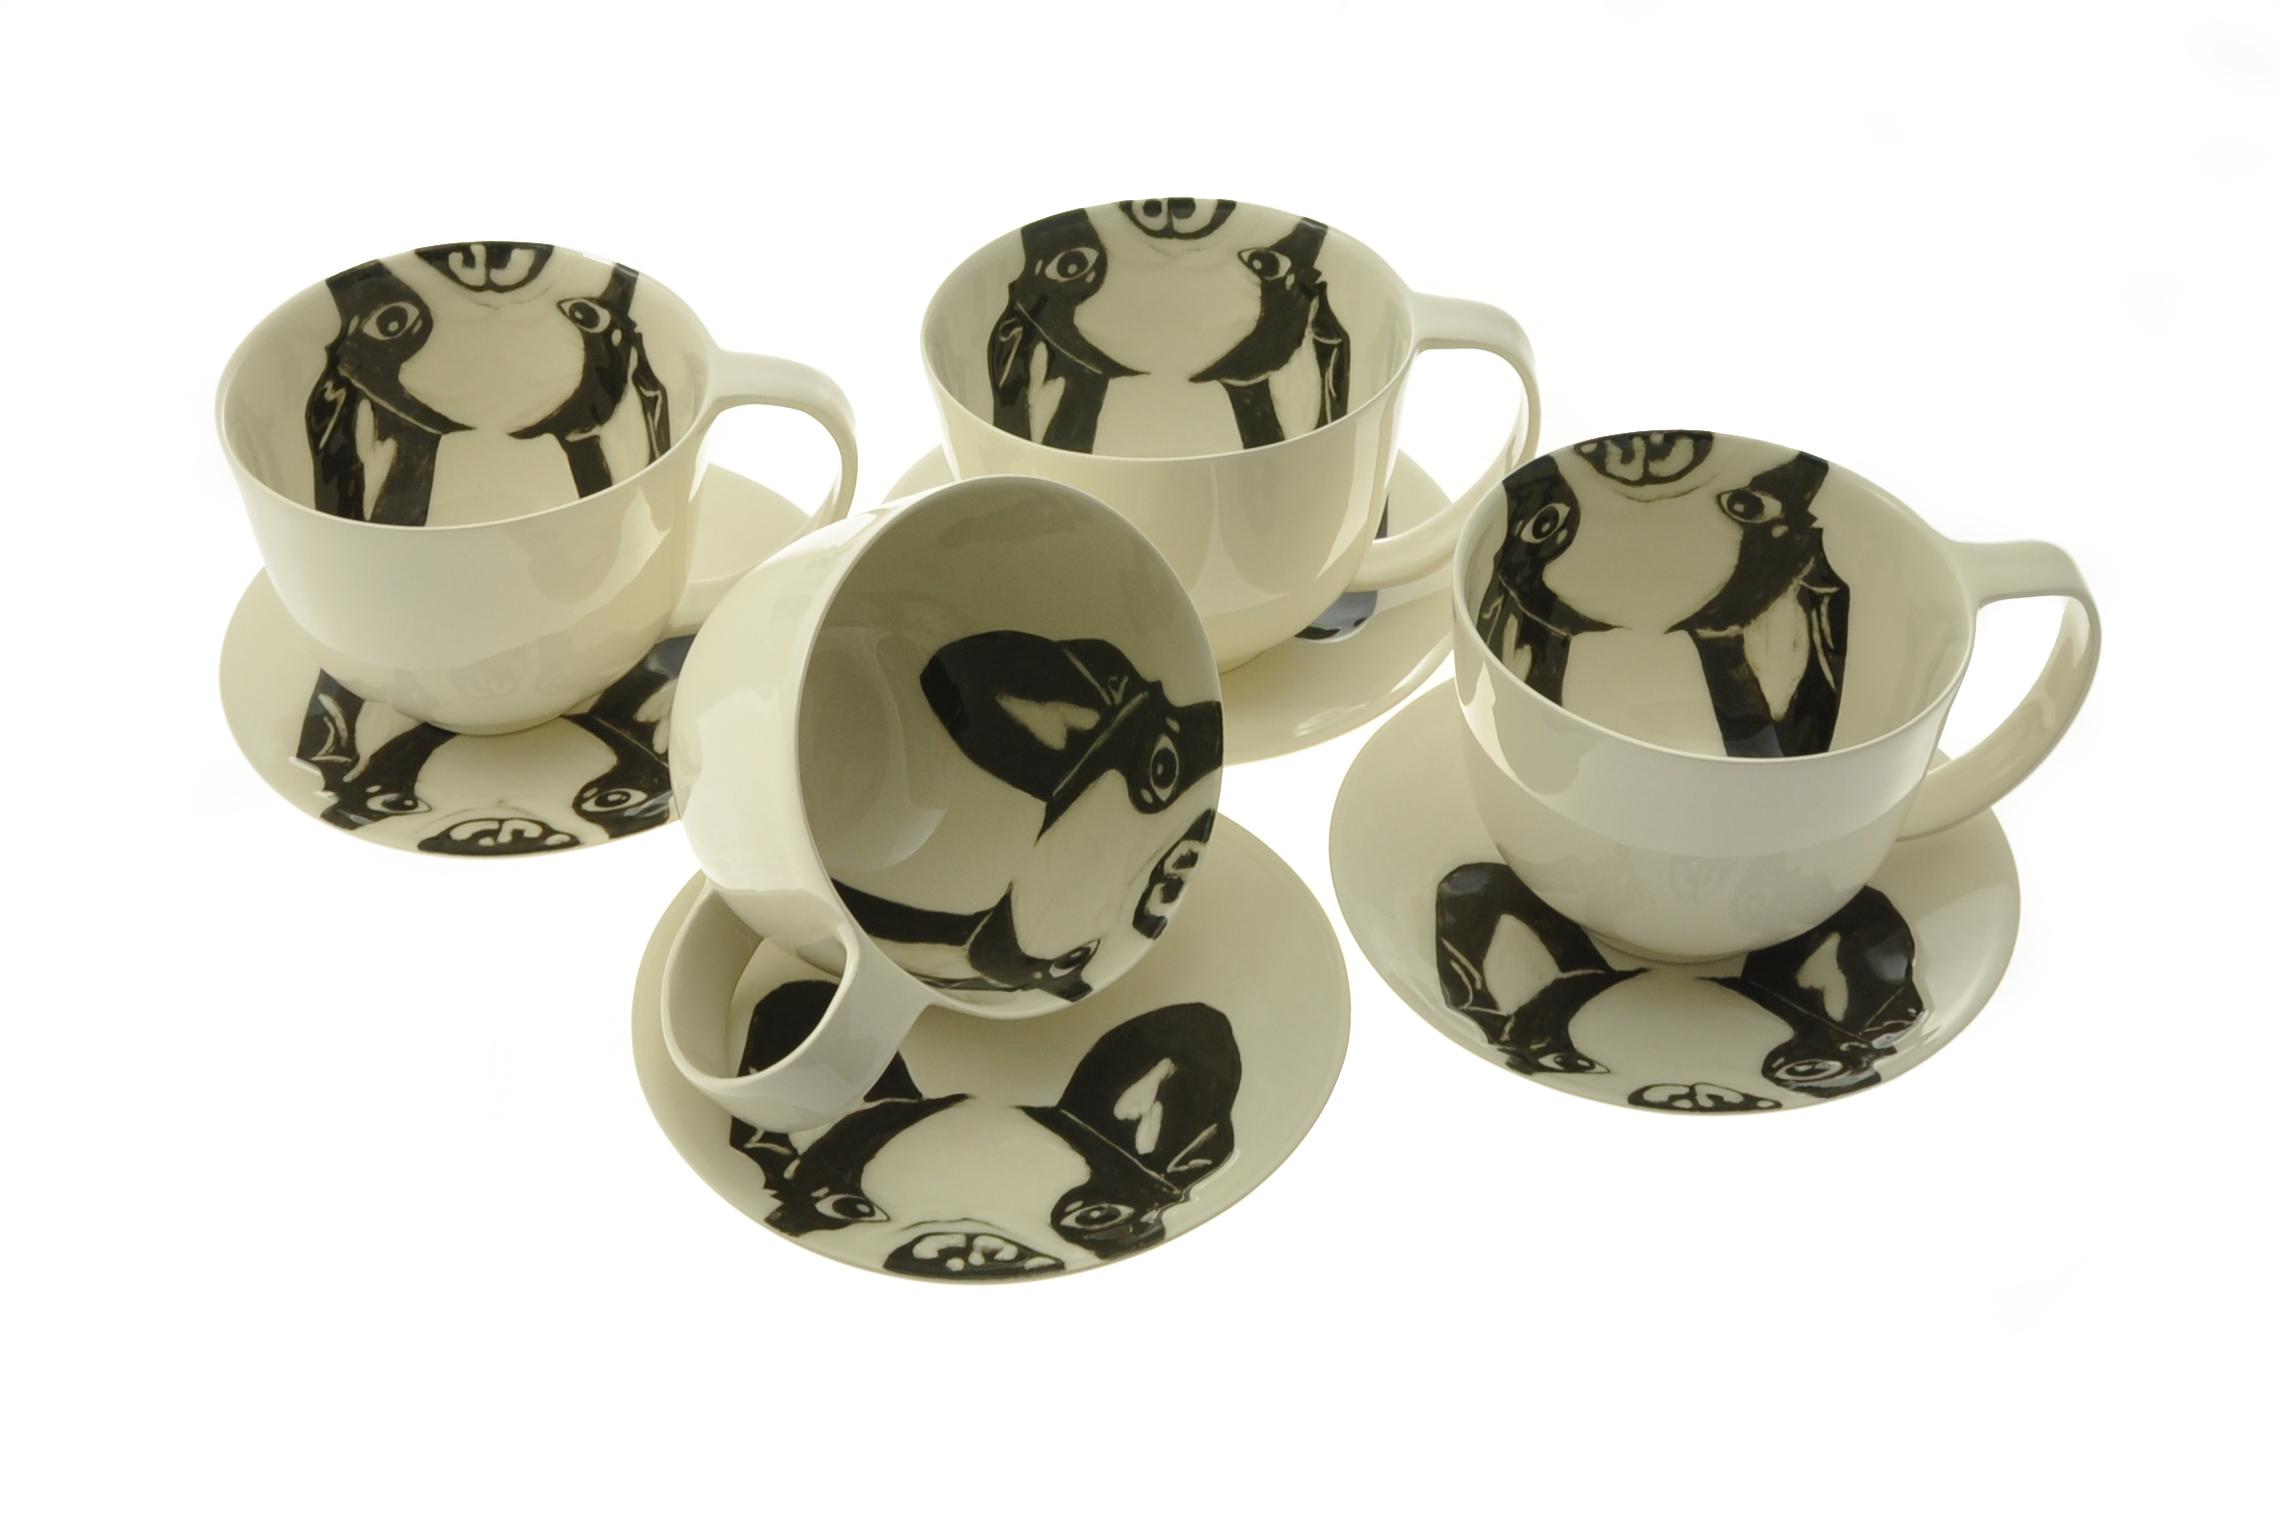 The French bulldog black&white series